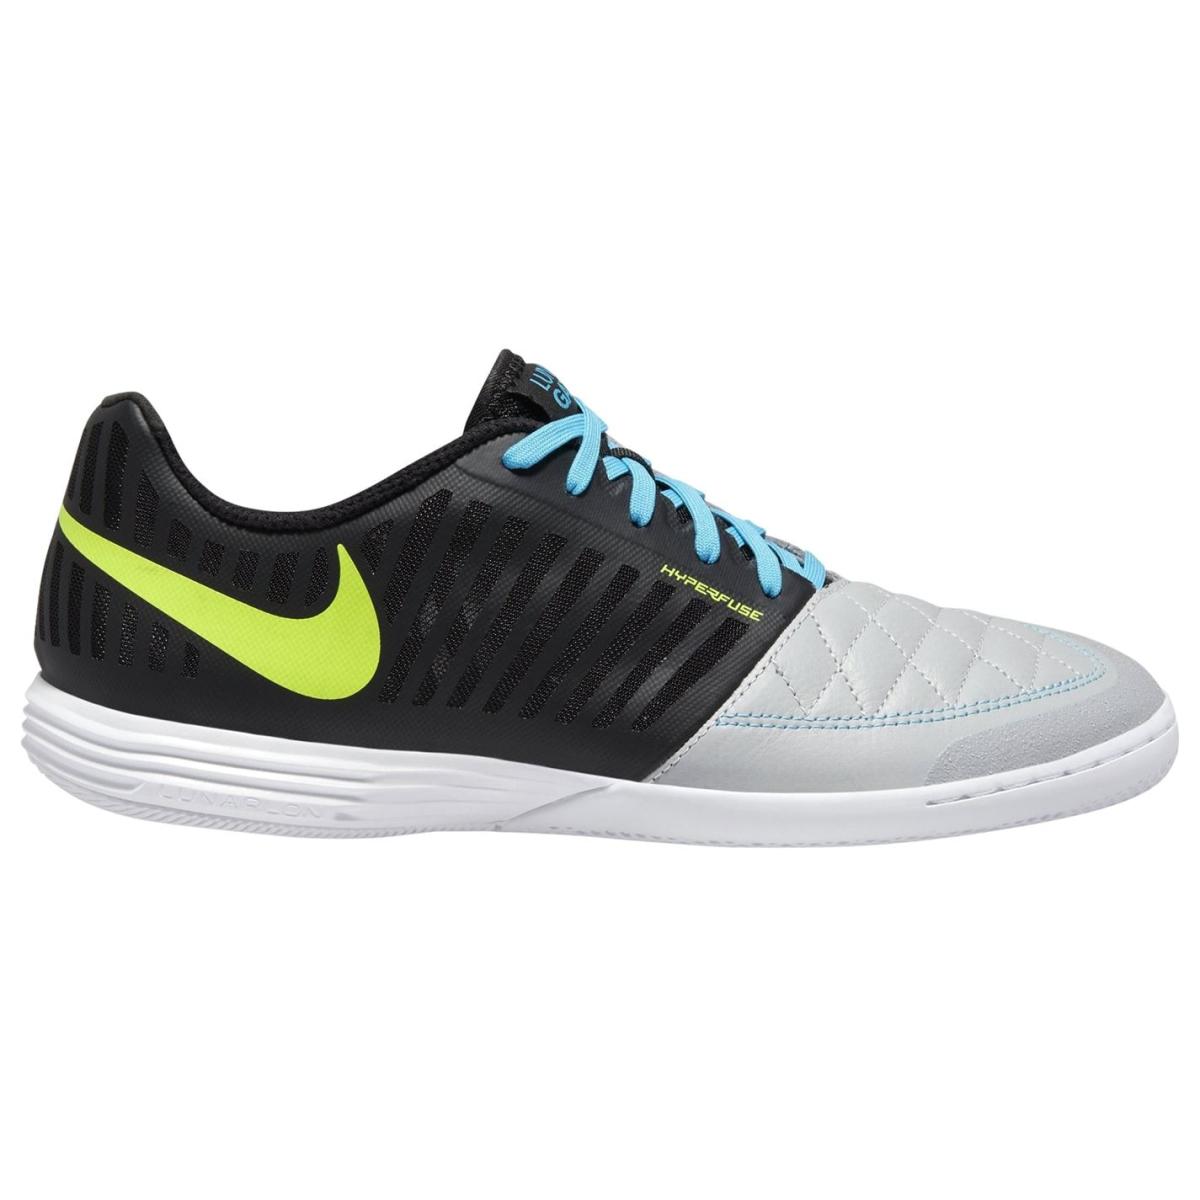 Nike Lunargato Hallenschuhe Fußballschuhe Indoor Herren Indoorschuhe 1009